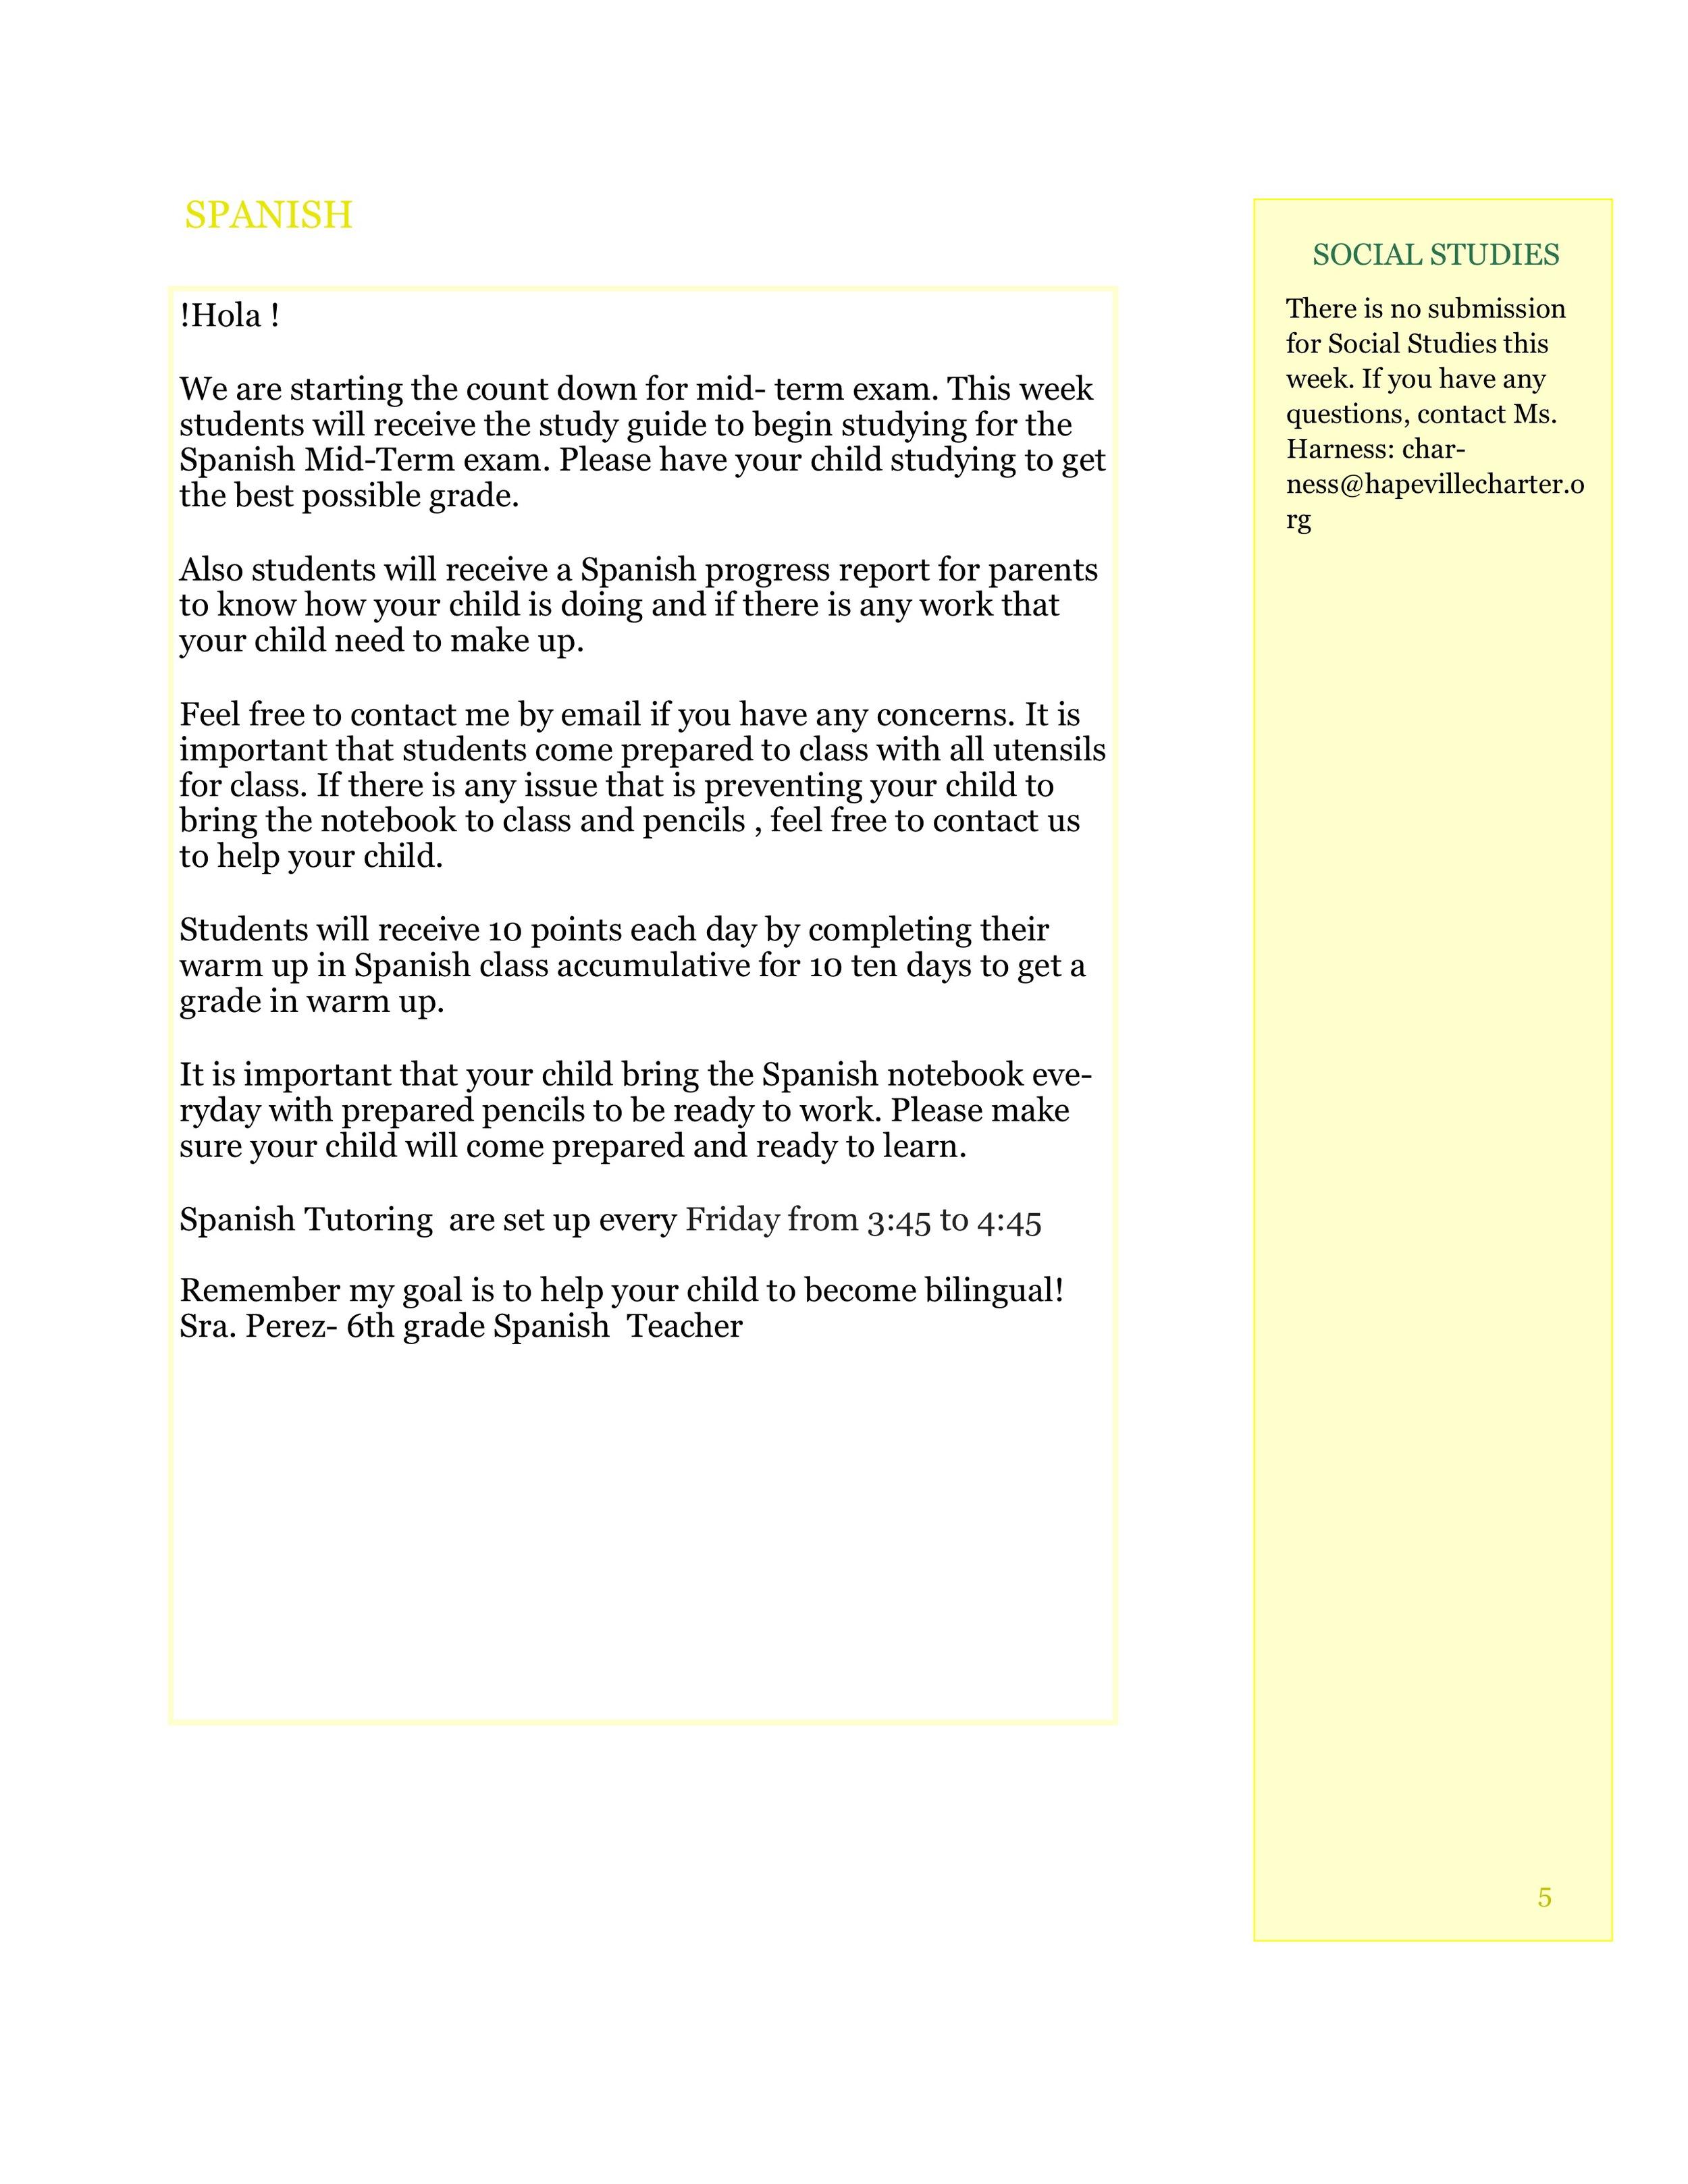 Newsletter Image6th grade December 8-12 5.jpeg